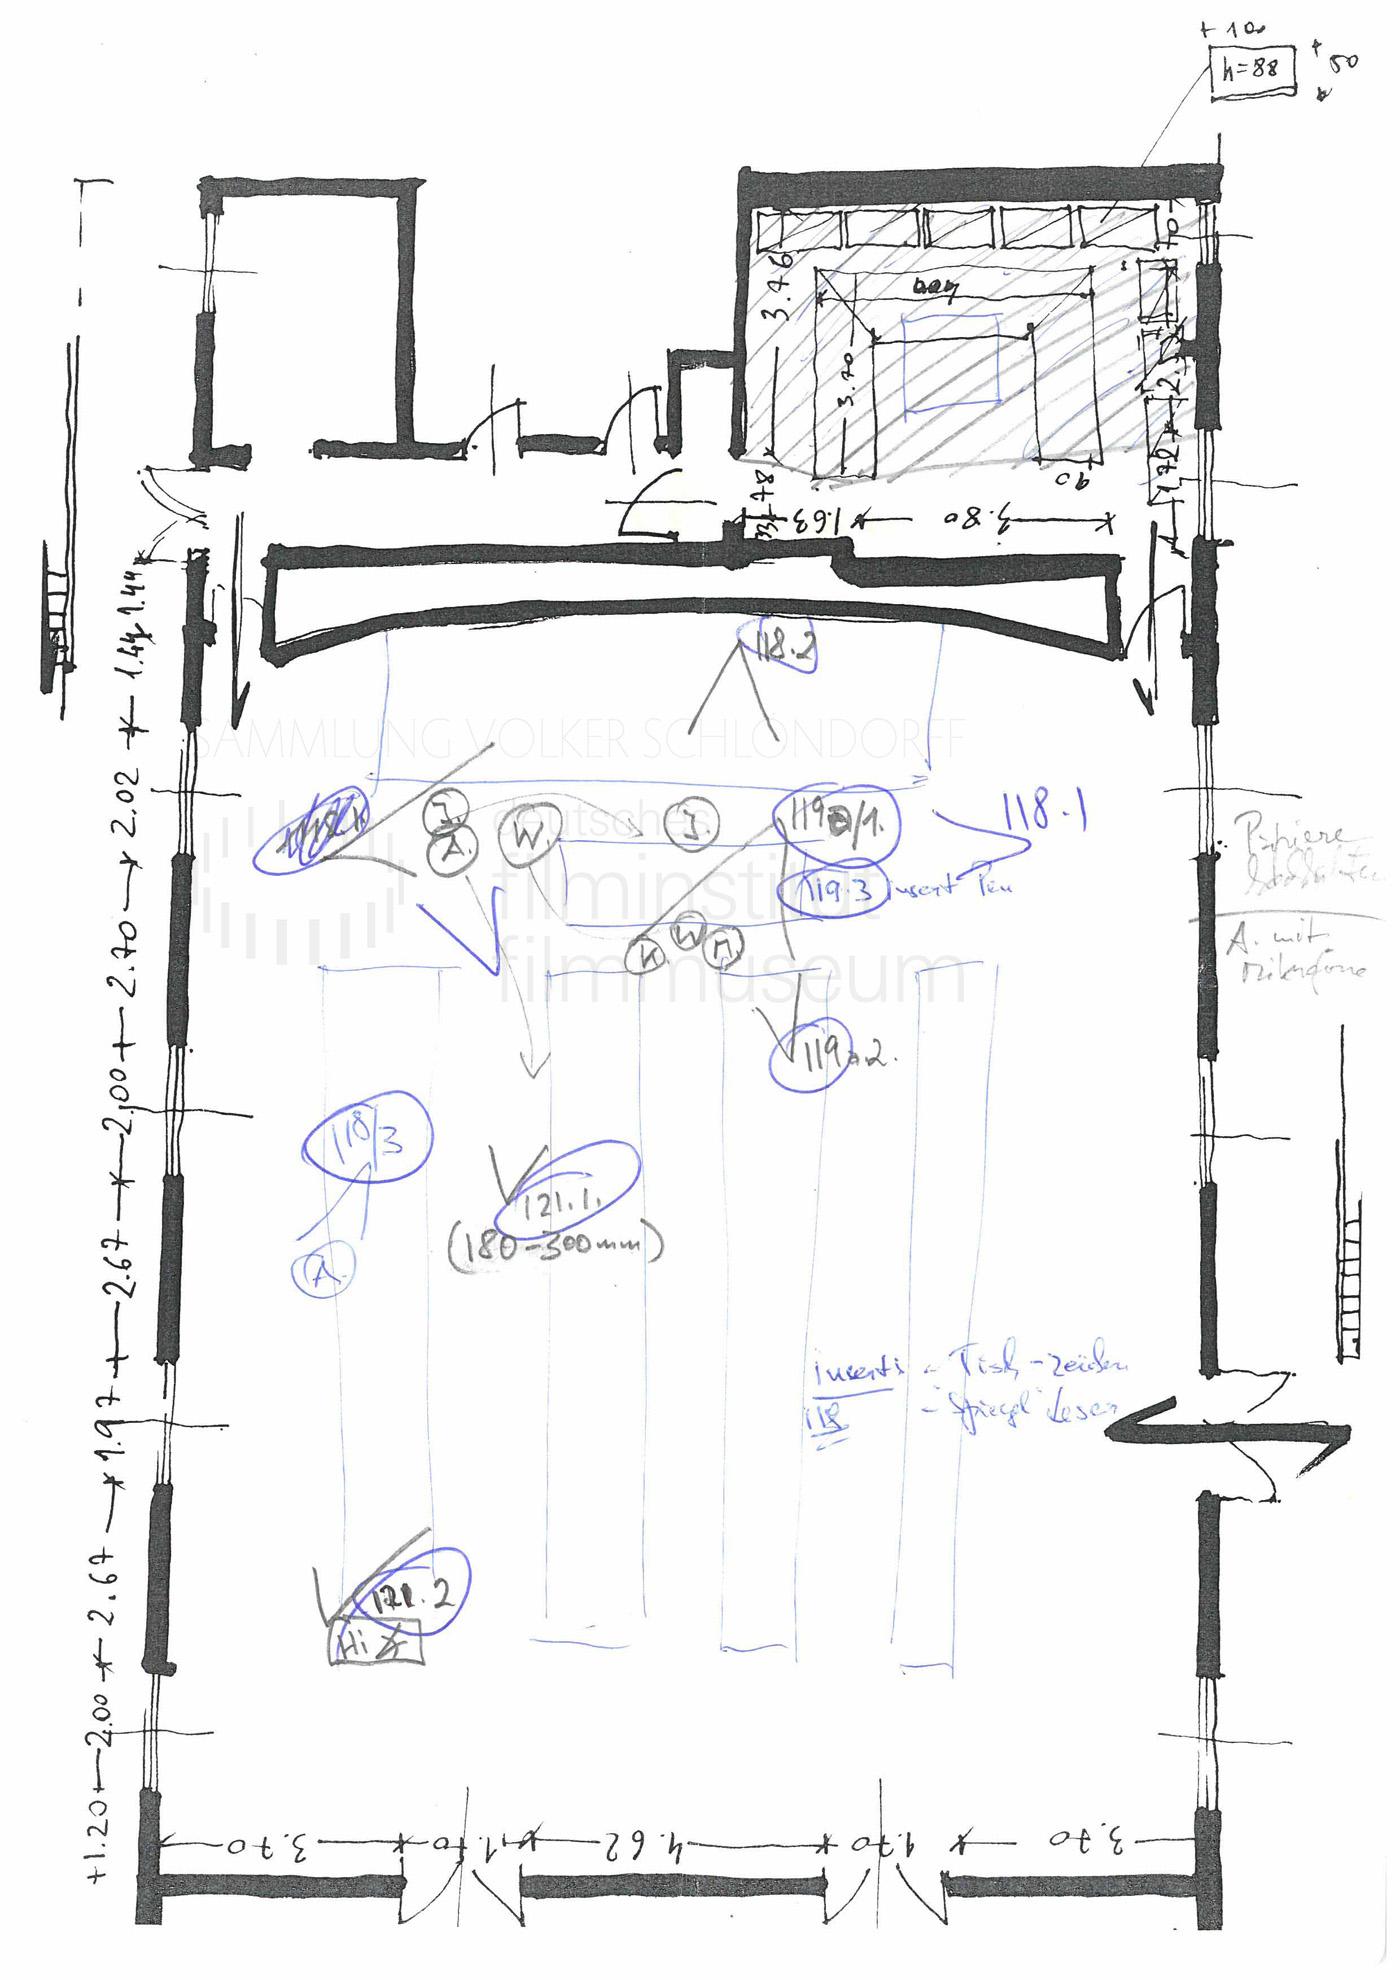 STRAJK // Produktionsmaterial / Skizze, 1c